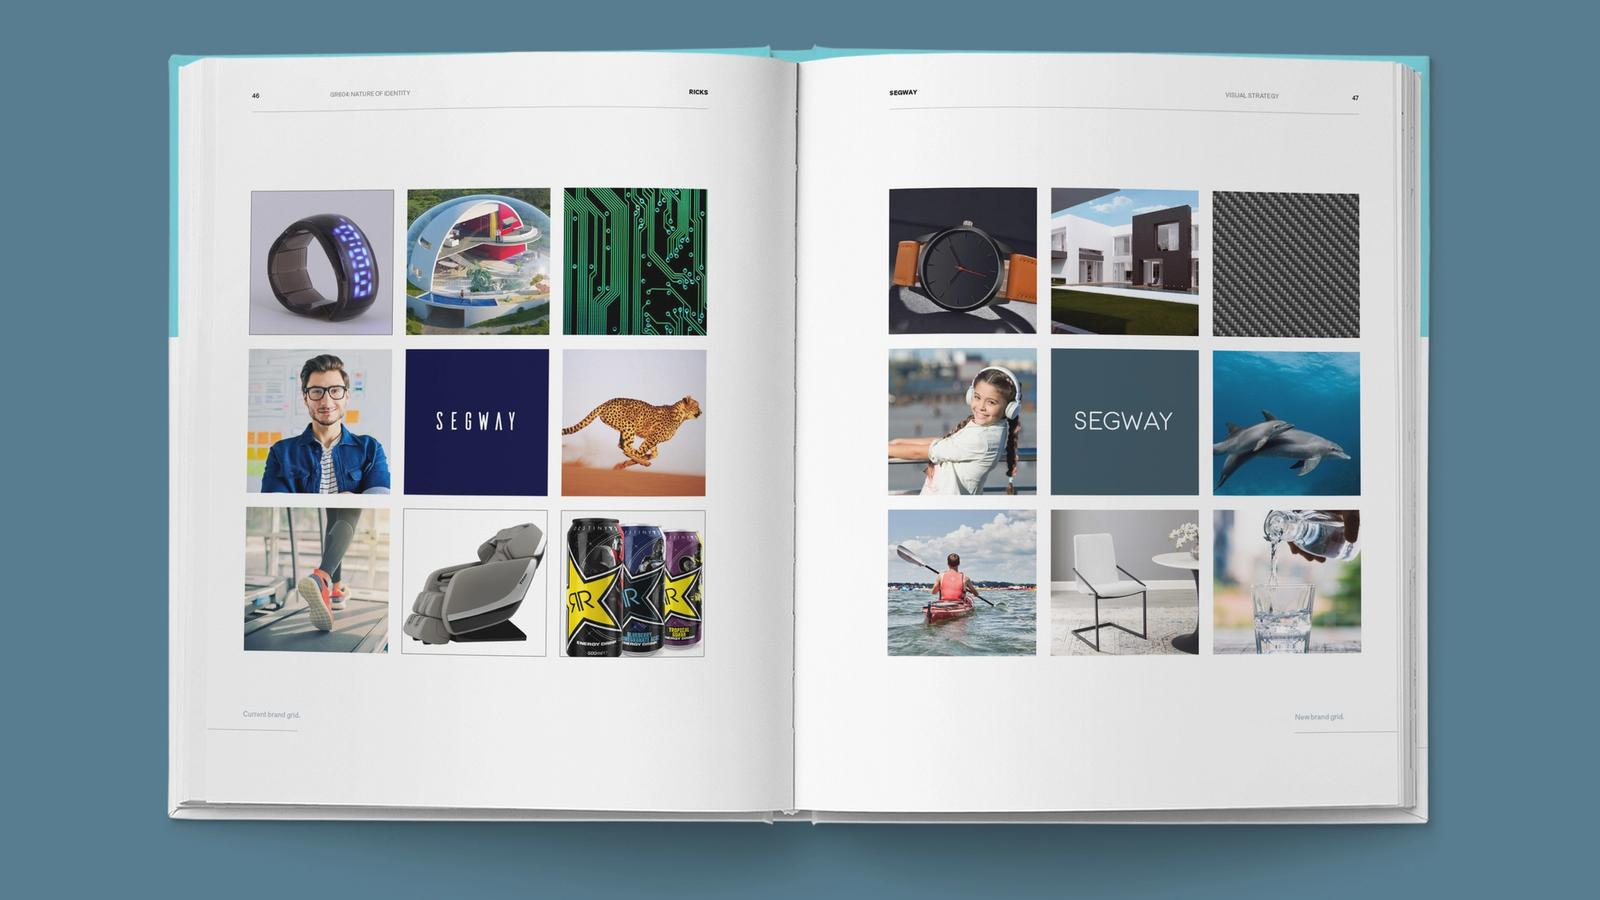 Segway Rebrand // Visual Strategy Guide